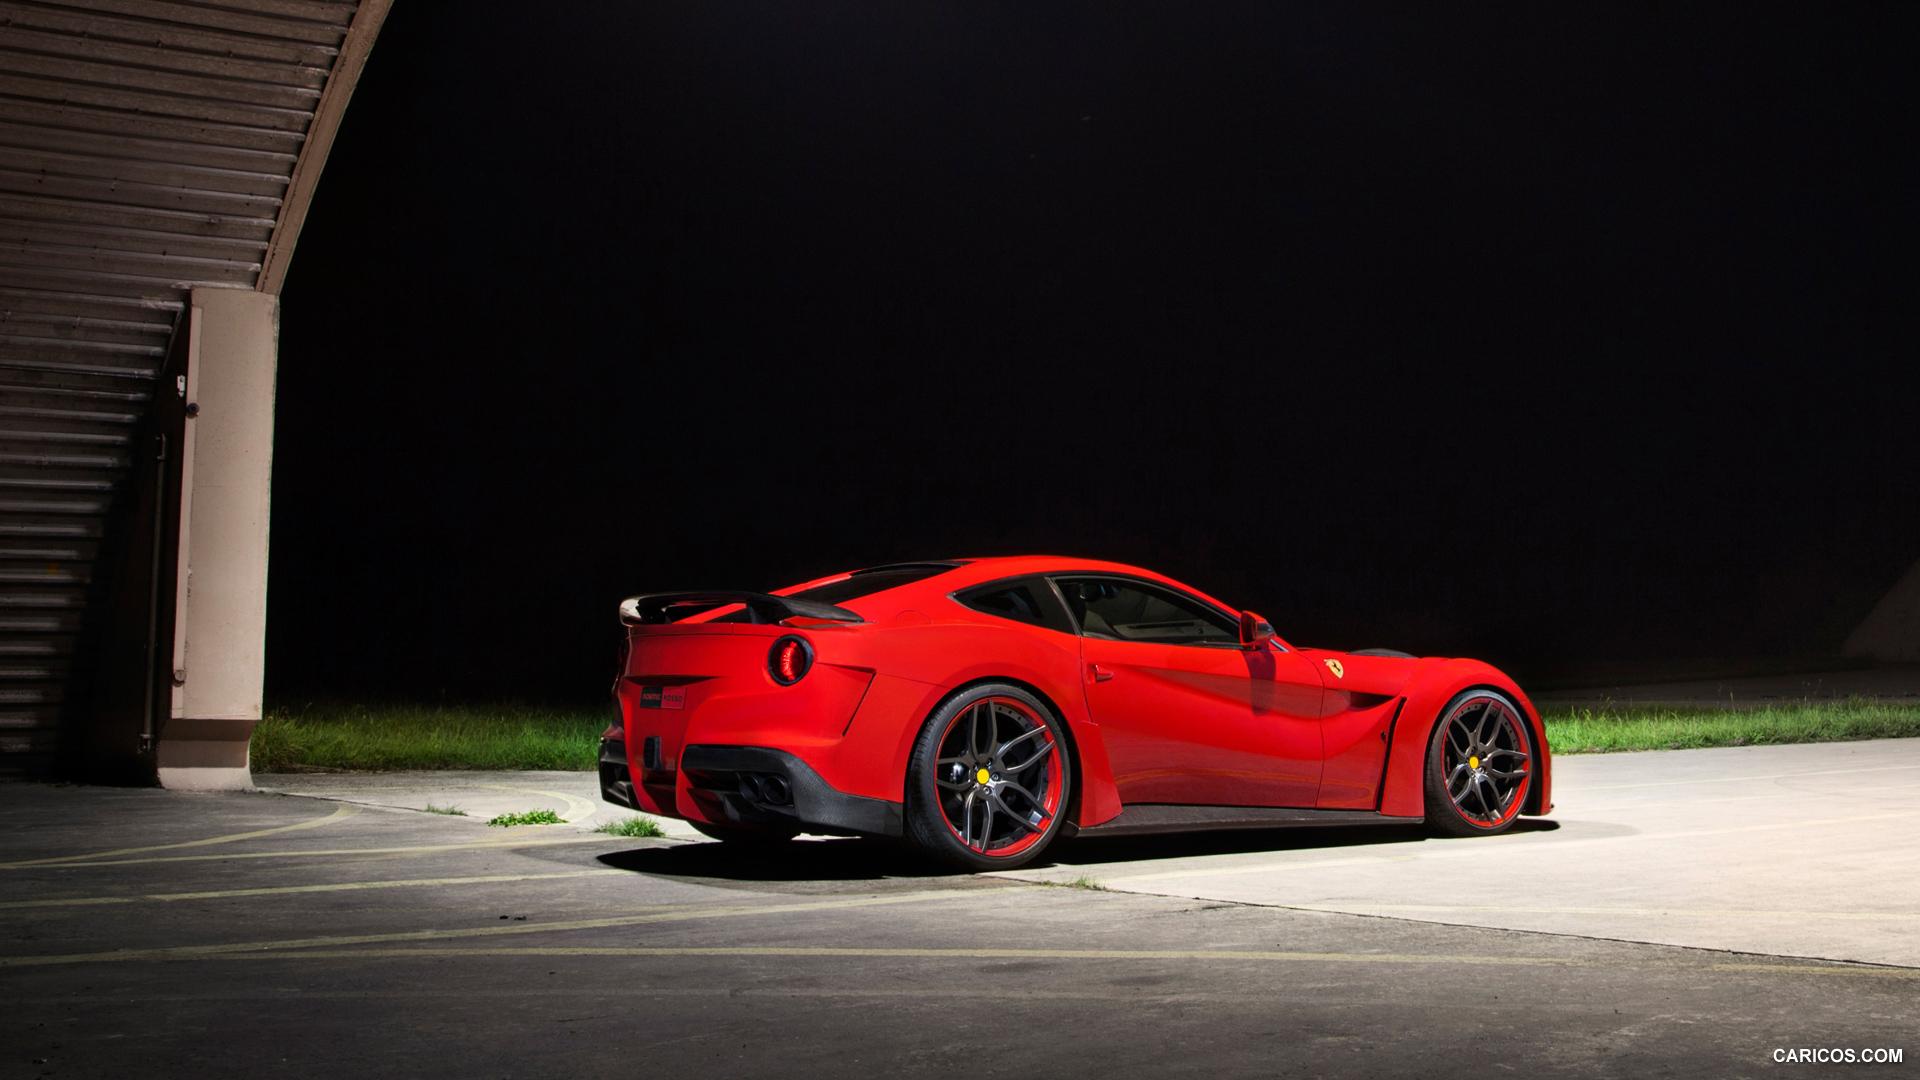 2014 NOVITEC ROSSO N LARGO Ferrari F12berlinetta   Side HD 1920x1080